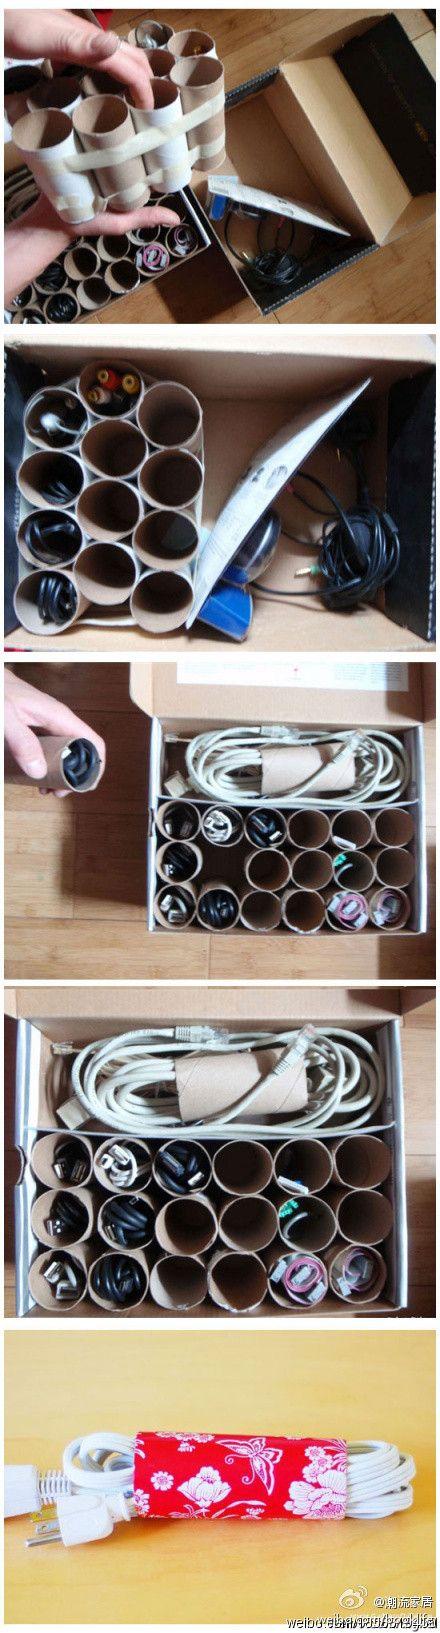 Cord storage!